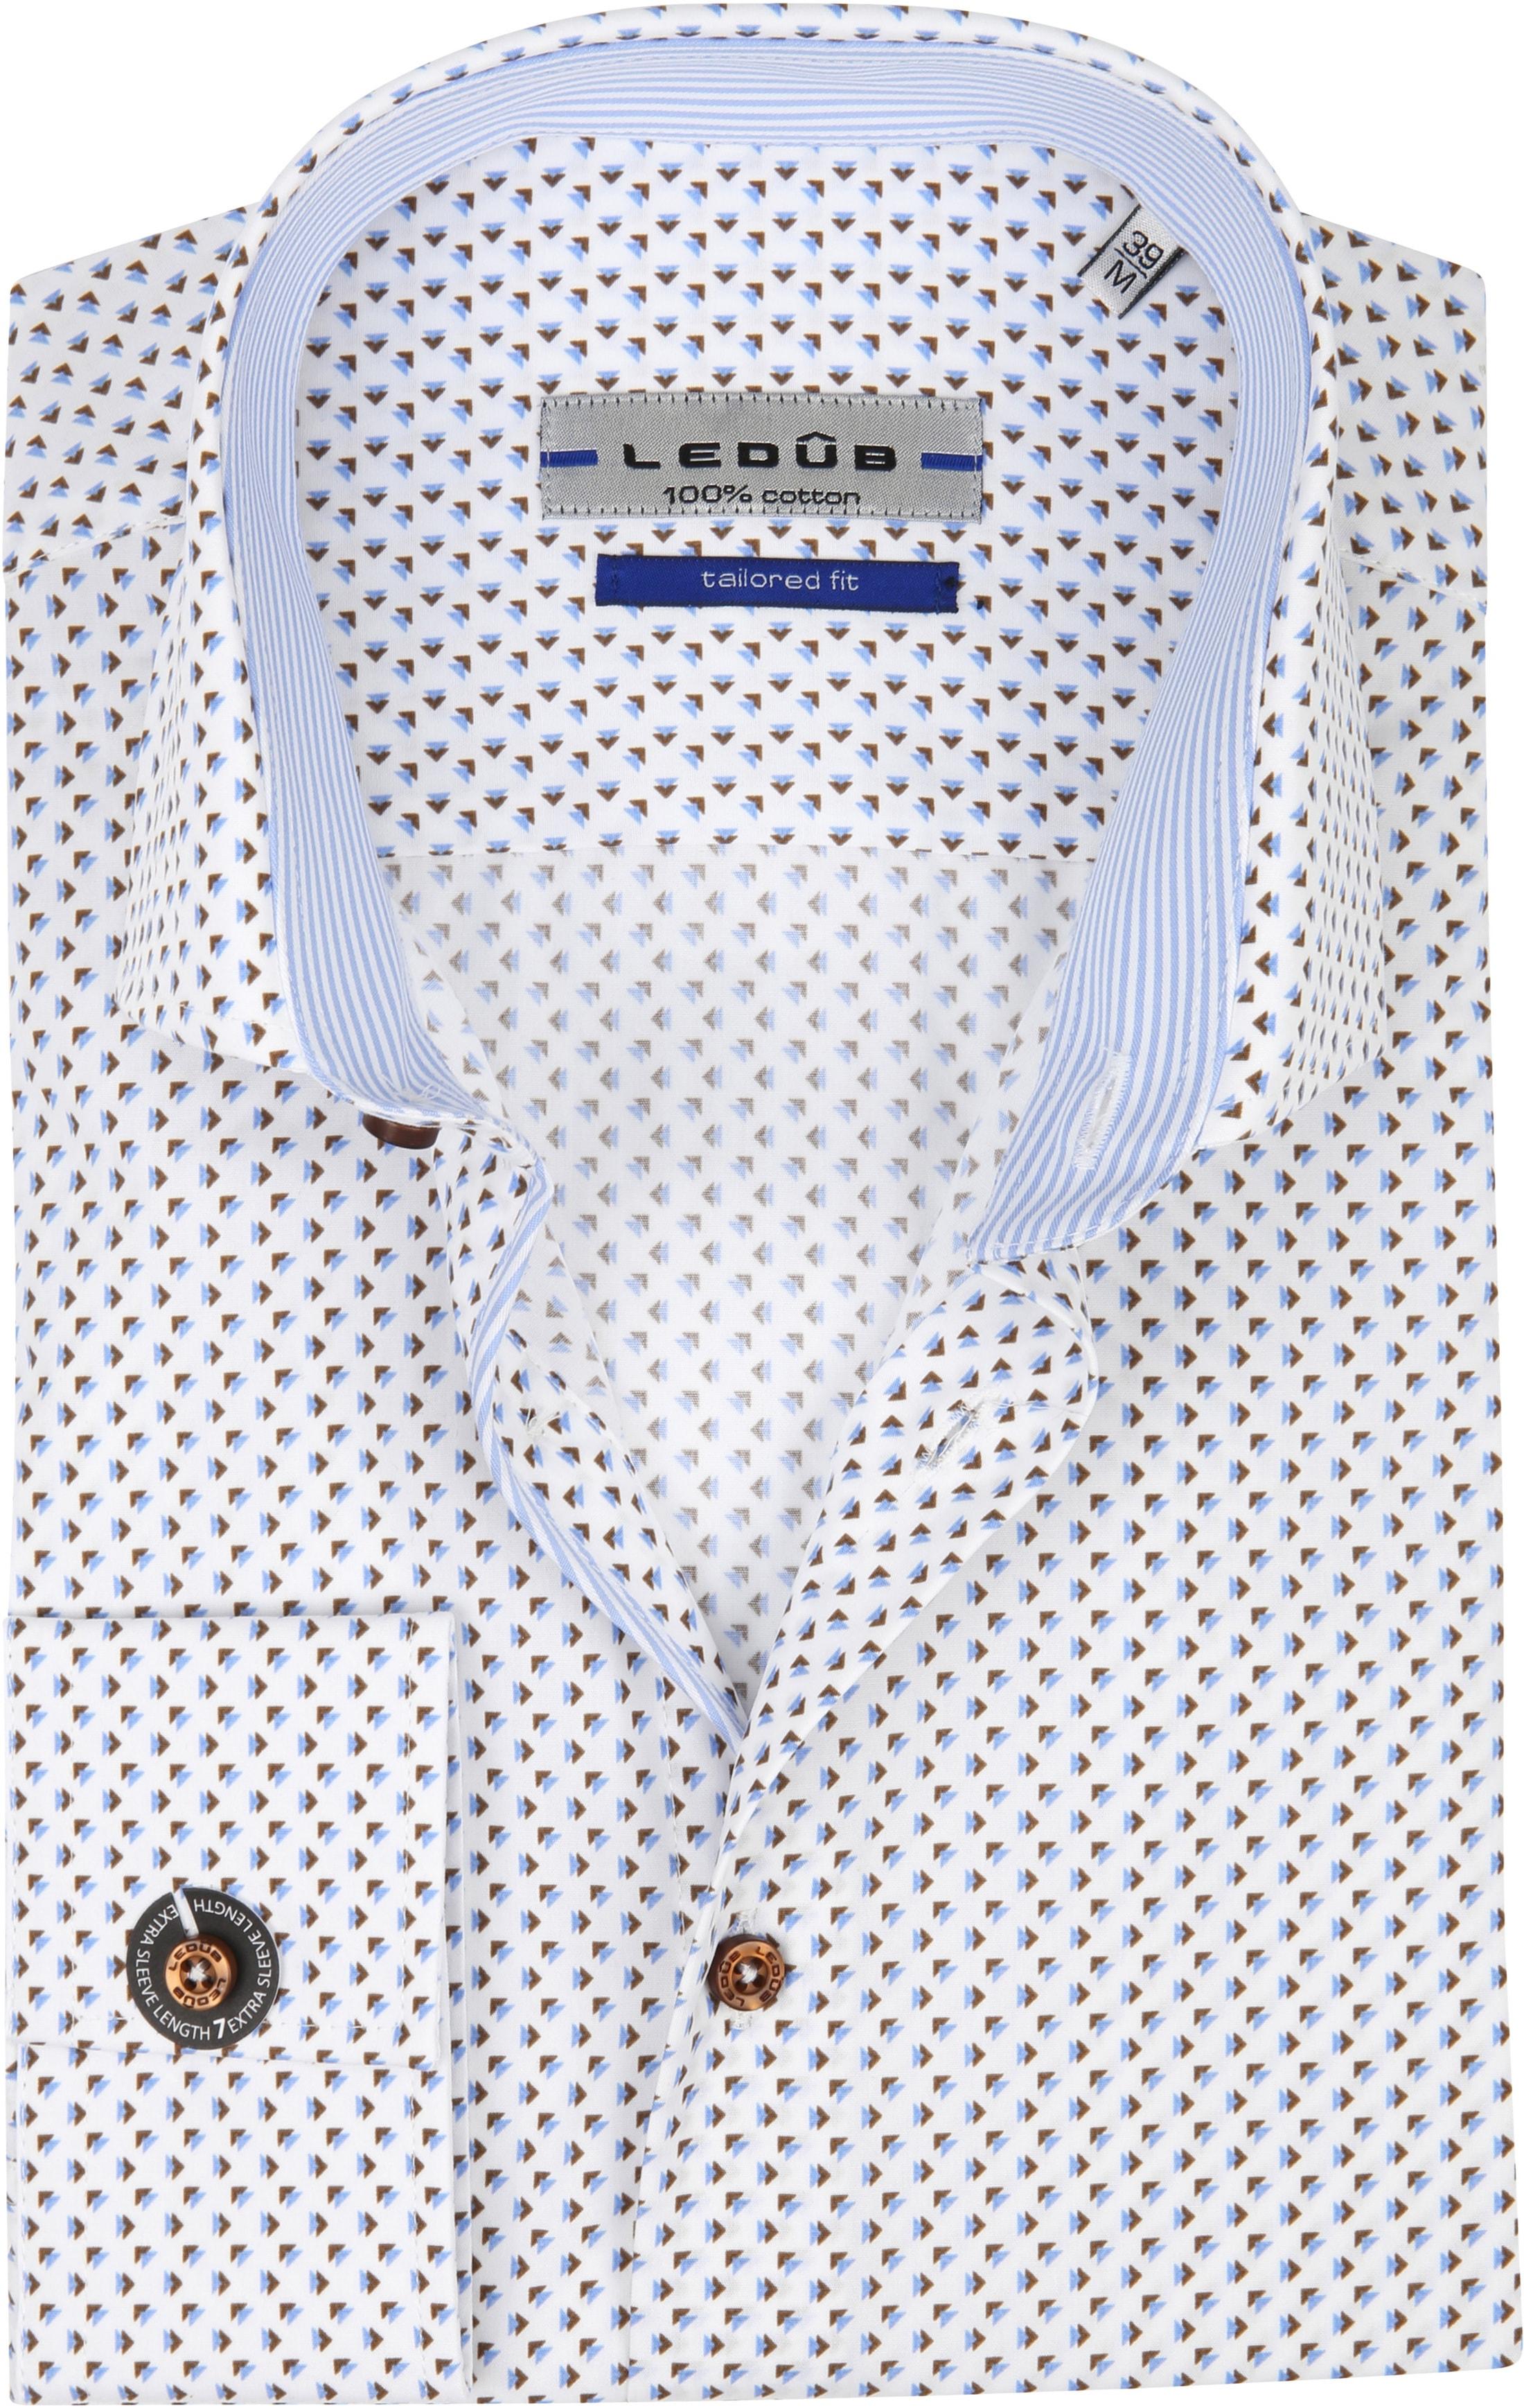 Ledub Overhemd Print Bruin Blauw SL7 foto 0